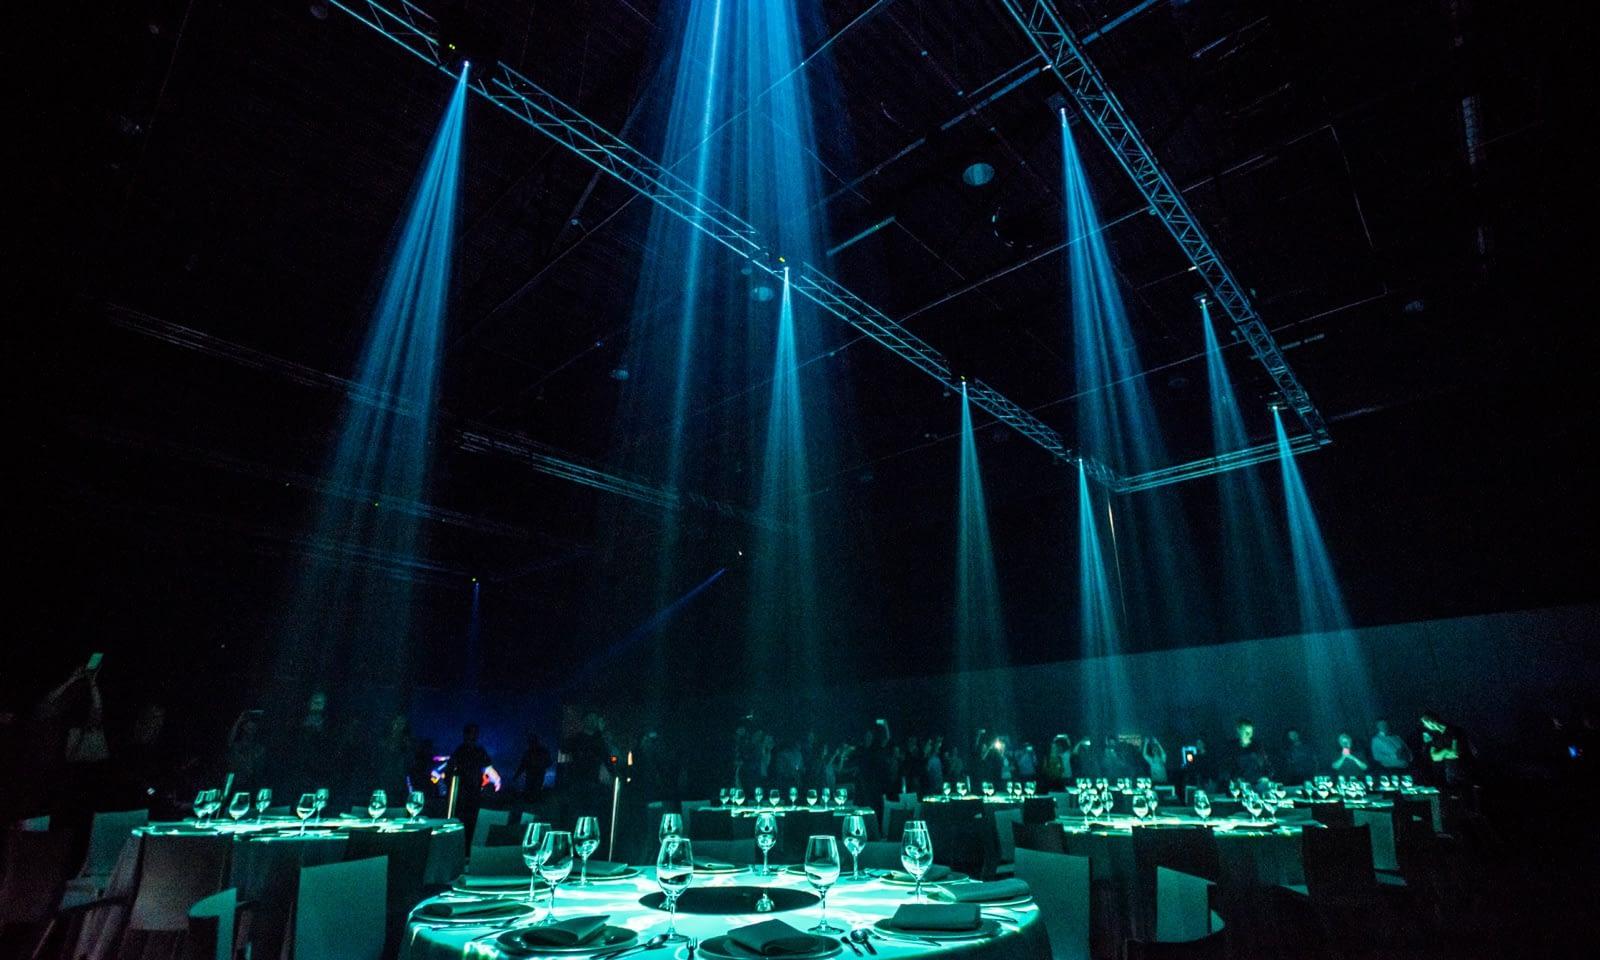 Sukces warsztatów Technologie eventowe od kuchni 2017 Brill AV Media